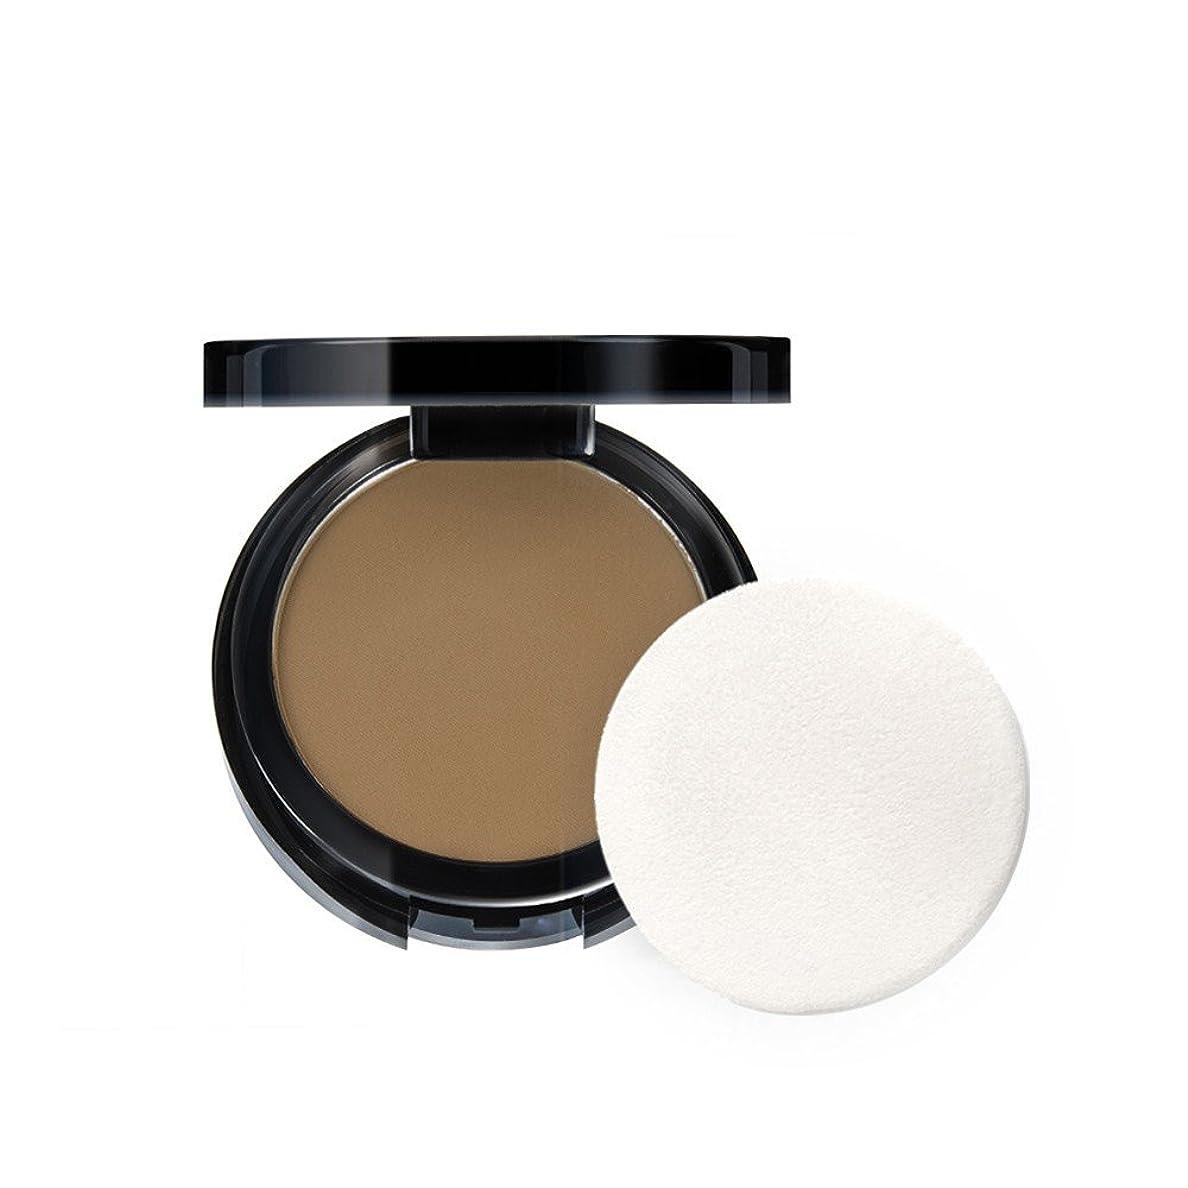 ABSOLUTE HD Flawless Powder Foundation - Natural Beige (並行輸入品)